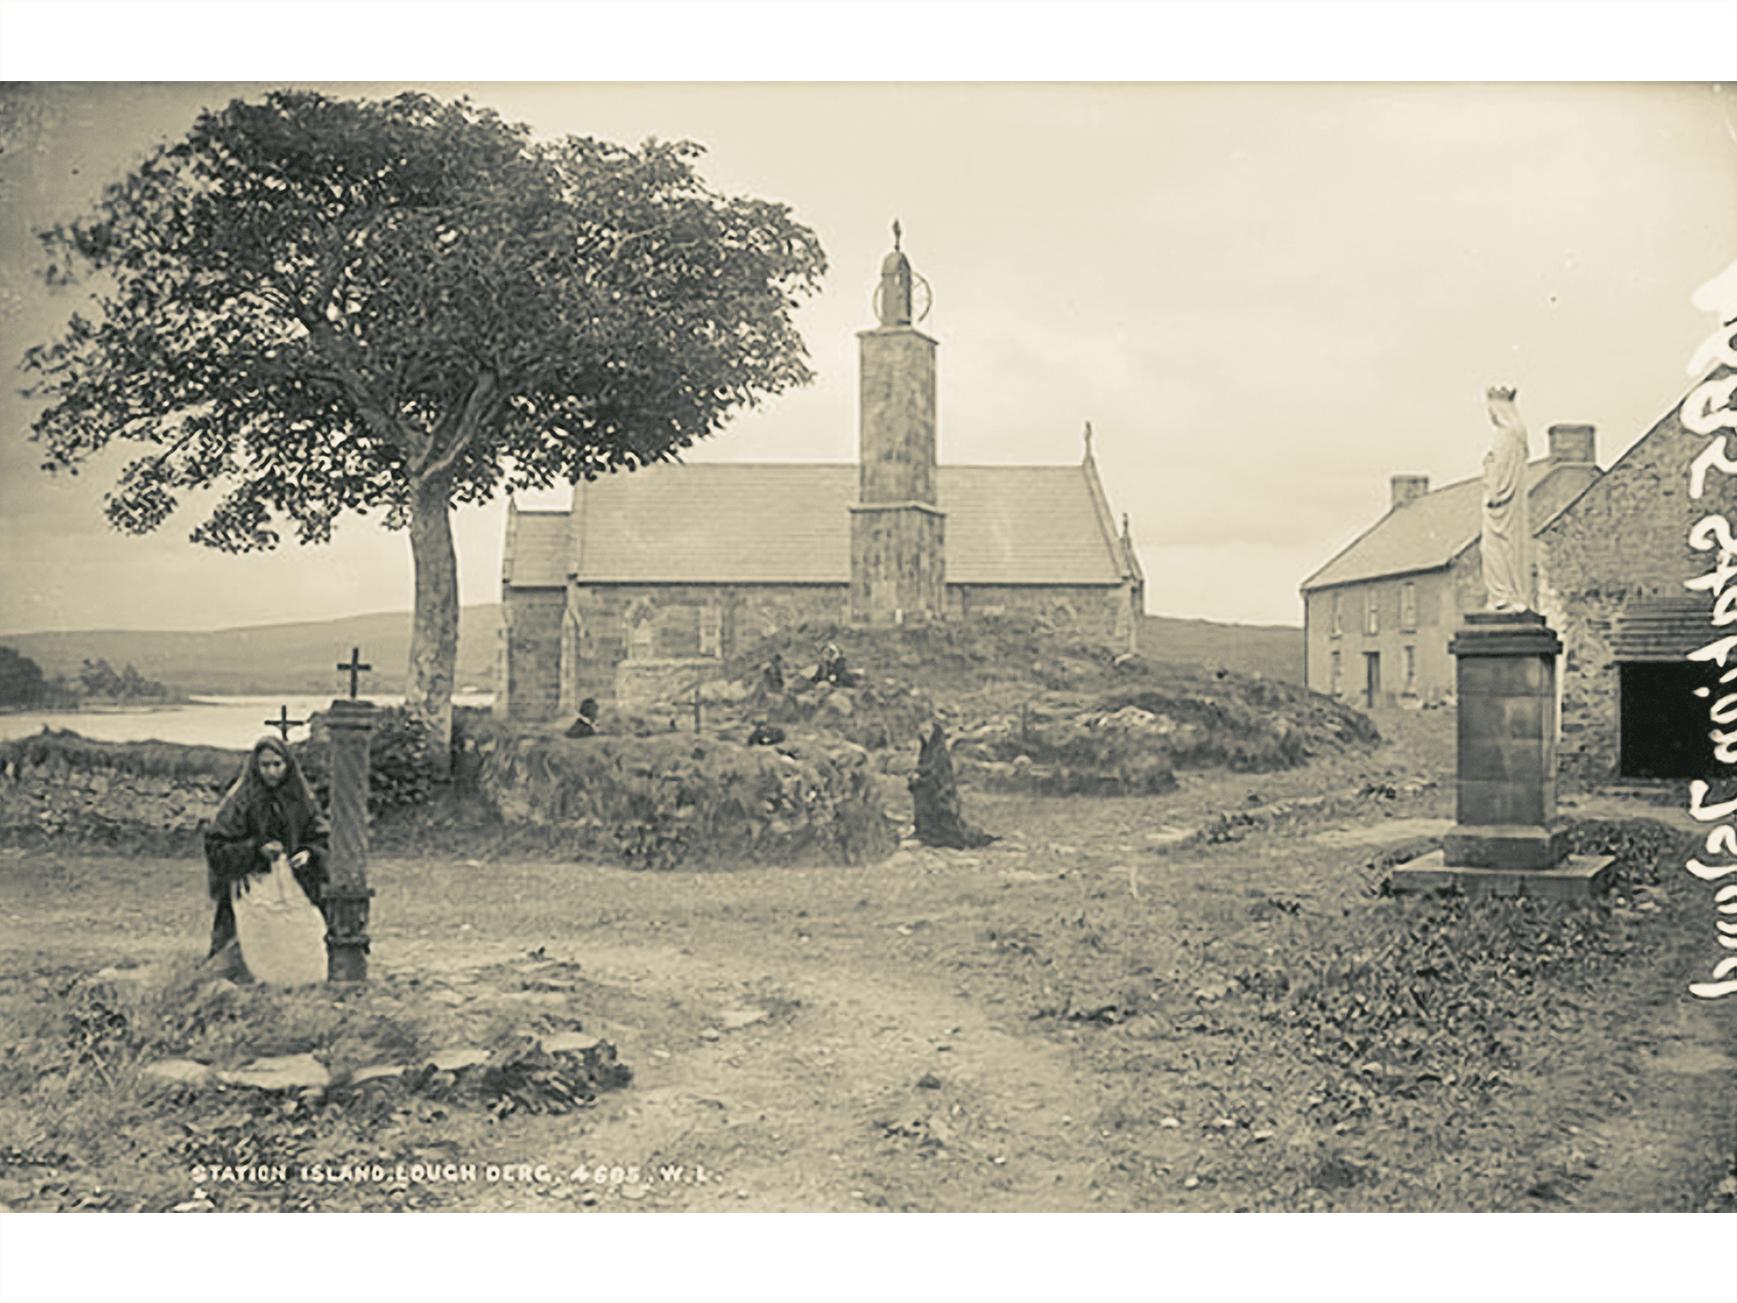 Station Island / Lough Derg / Ireland